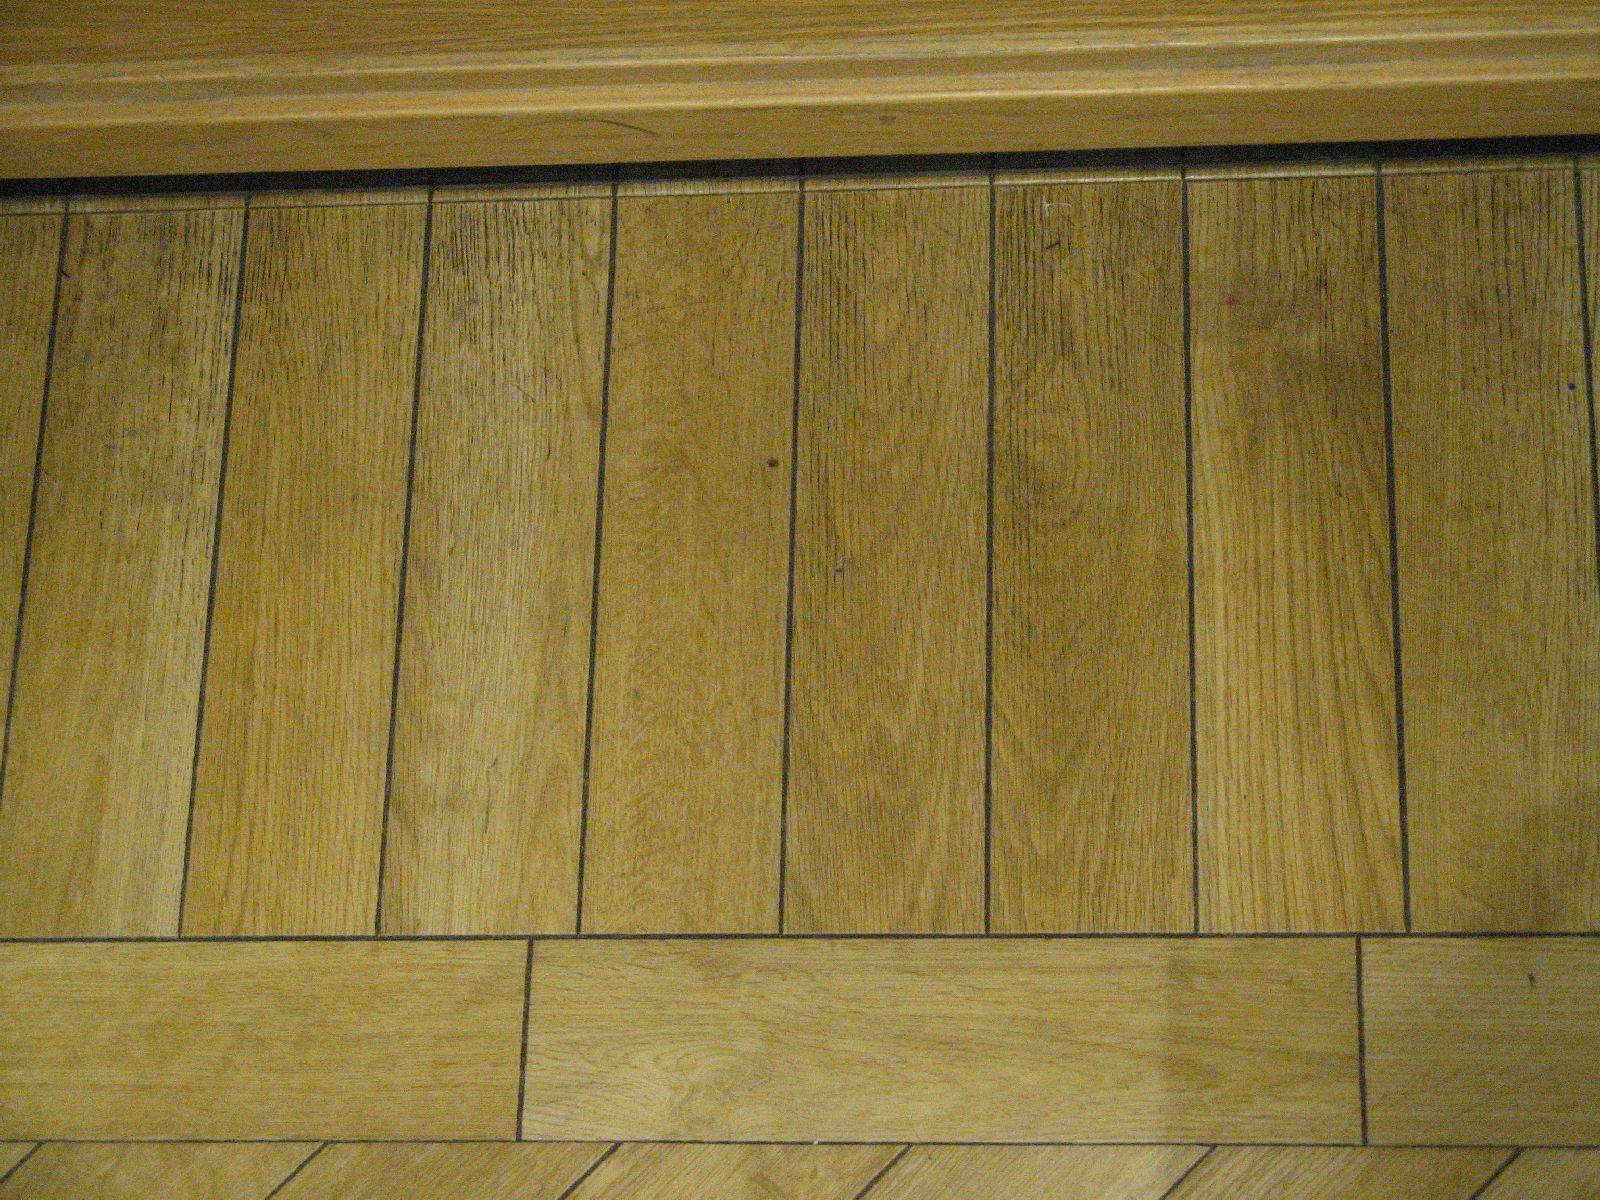 Wood_Textures_B_0134